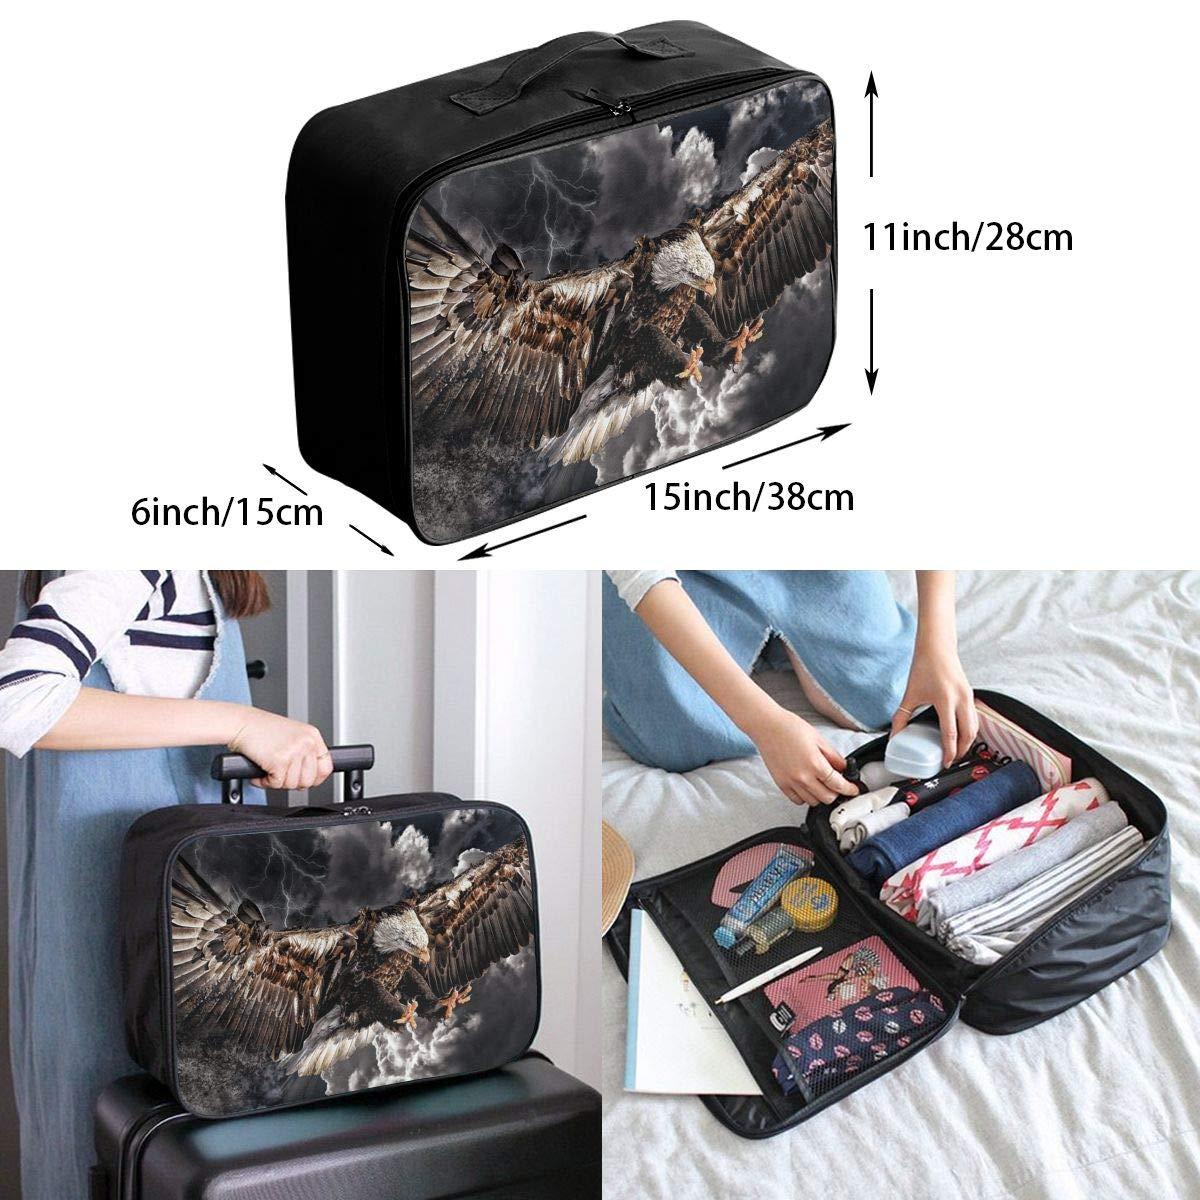 Travel Luggage Duffle Bag Lightweight Portable Handbag Eagle Print Large Capacity Waterproof Foldable Storage Tote